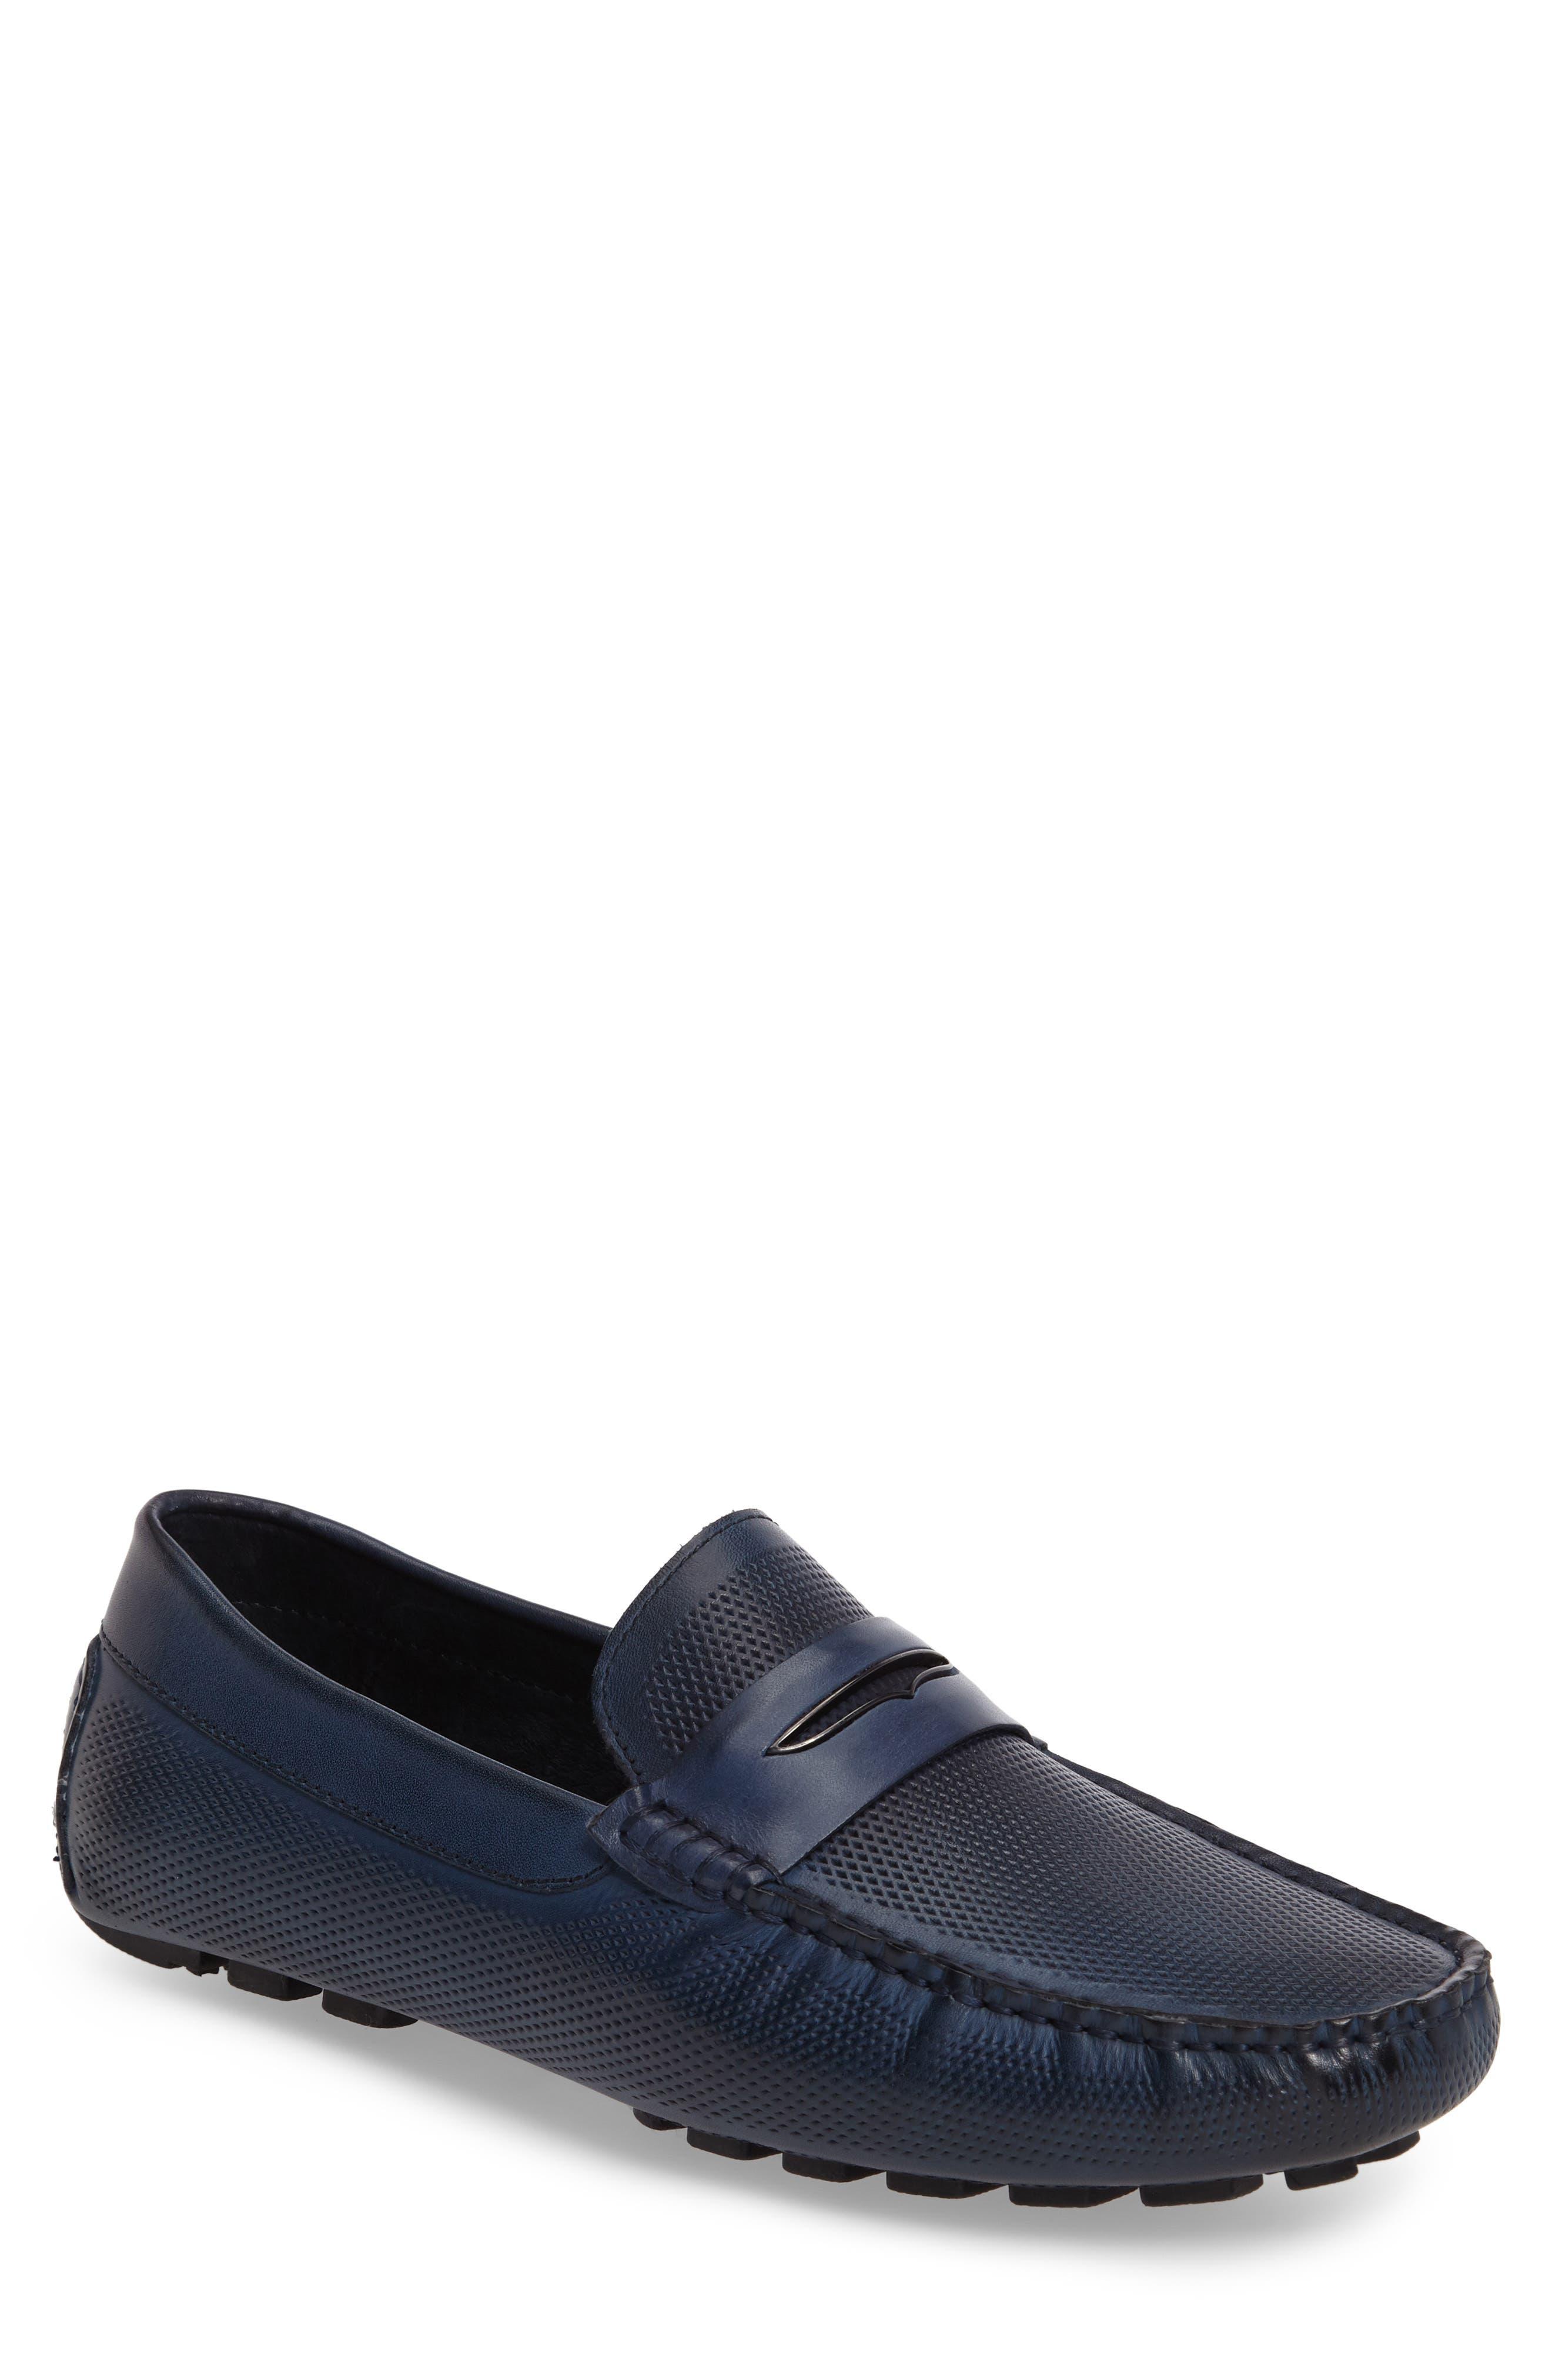 Mondrian Driving Shoe,                             Main thumbnail 1, color,                             Blue Leather